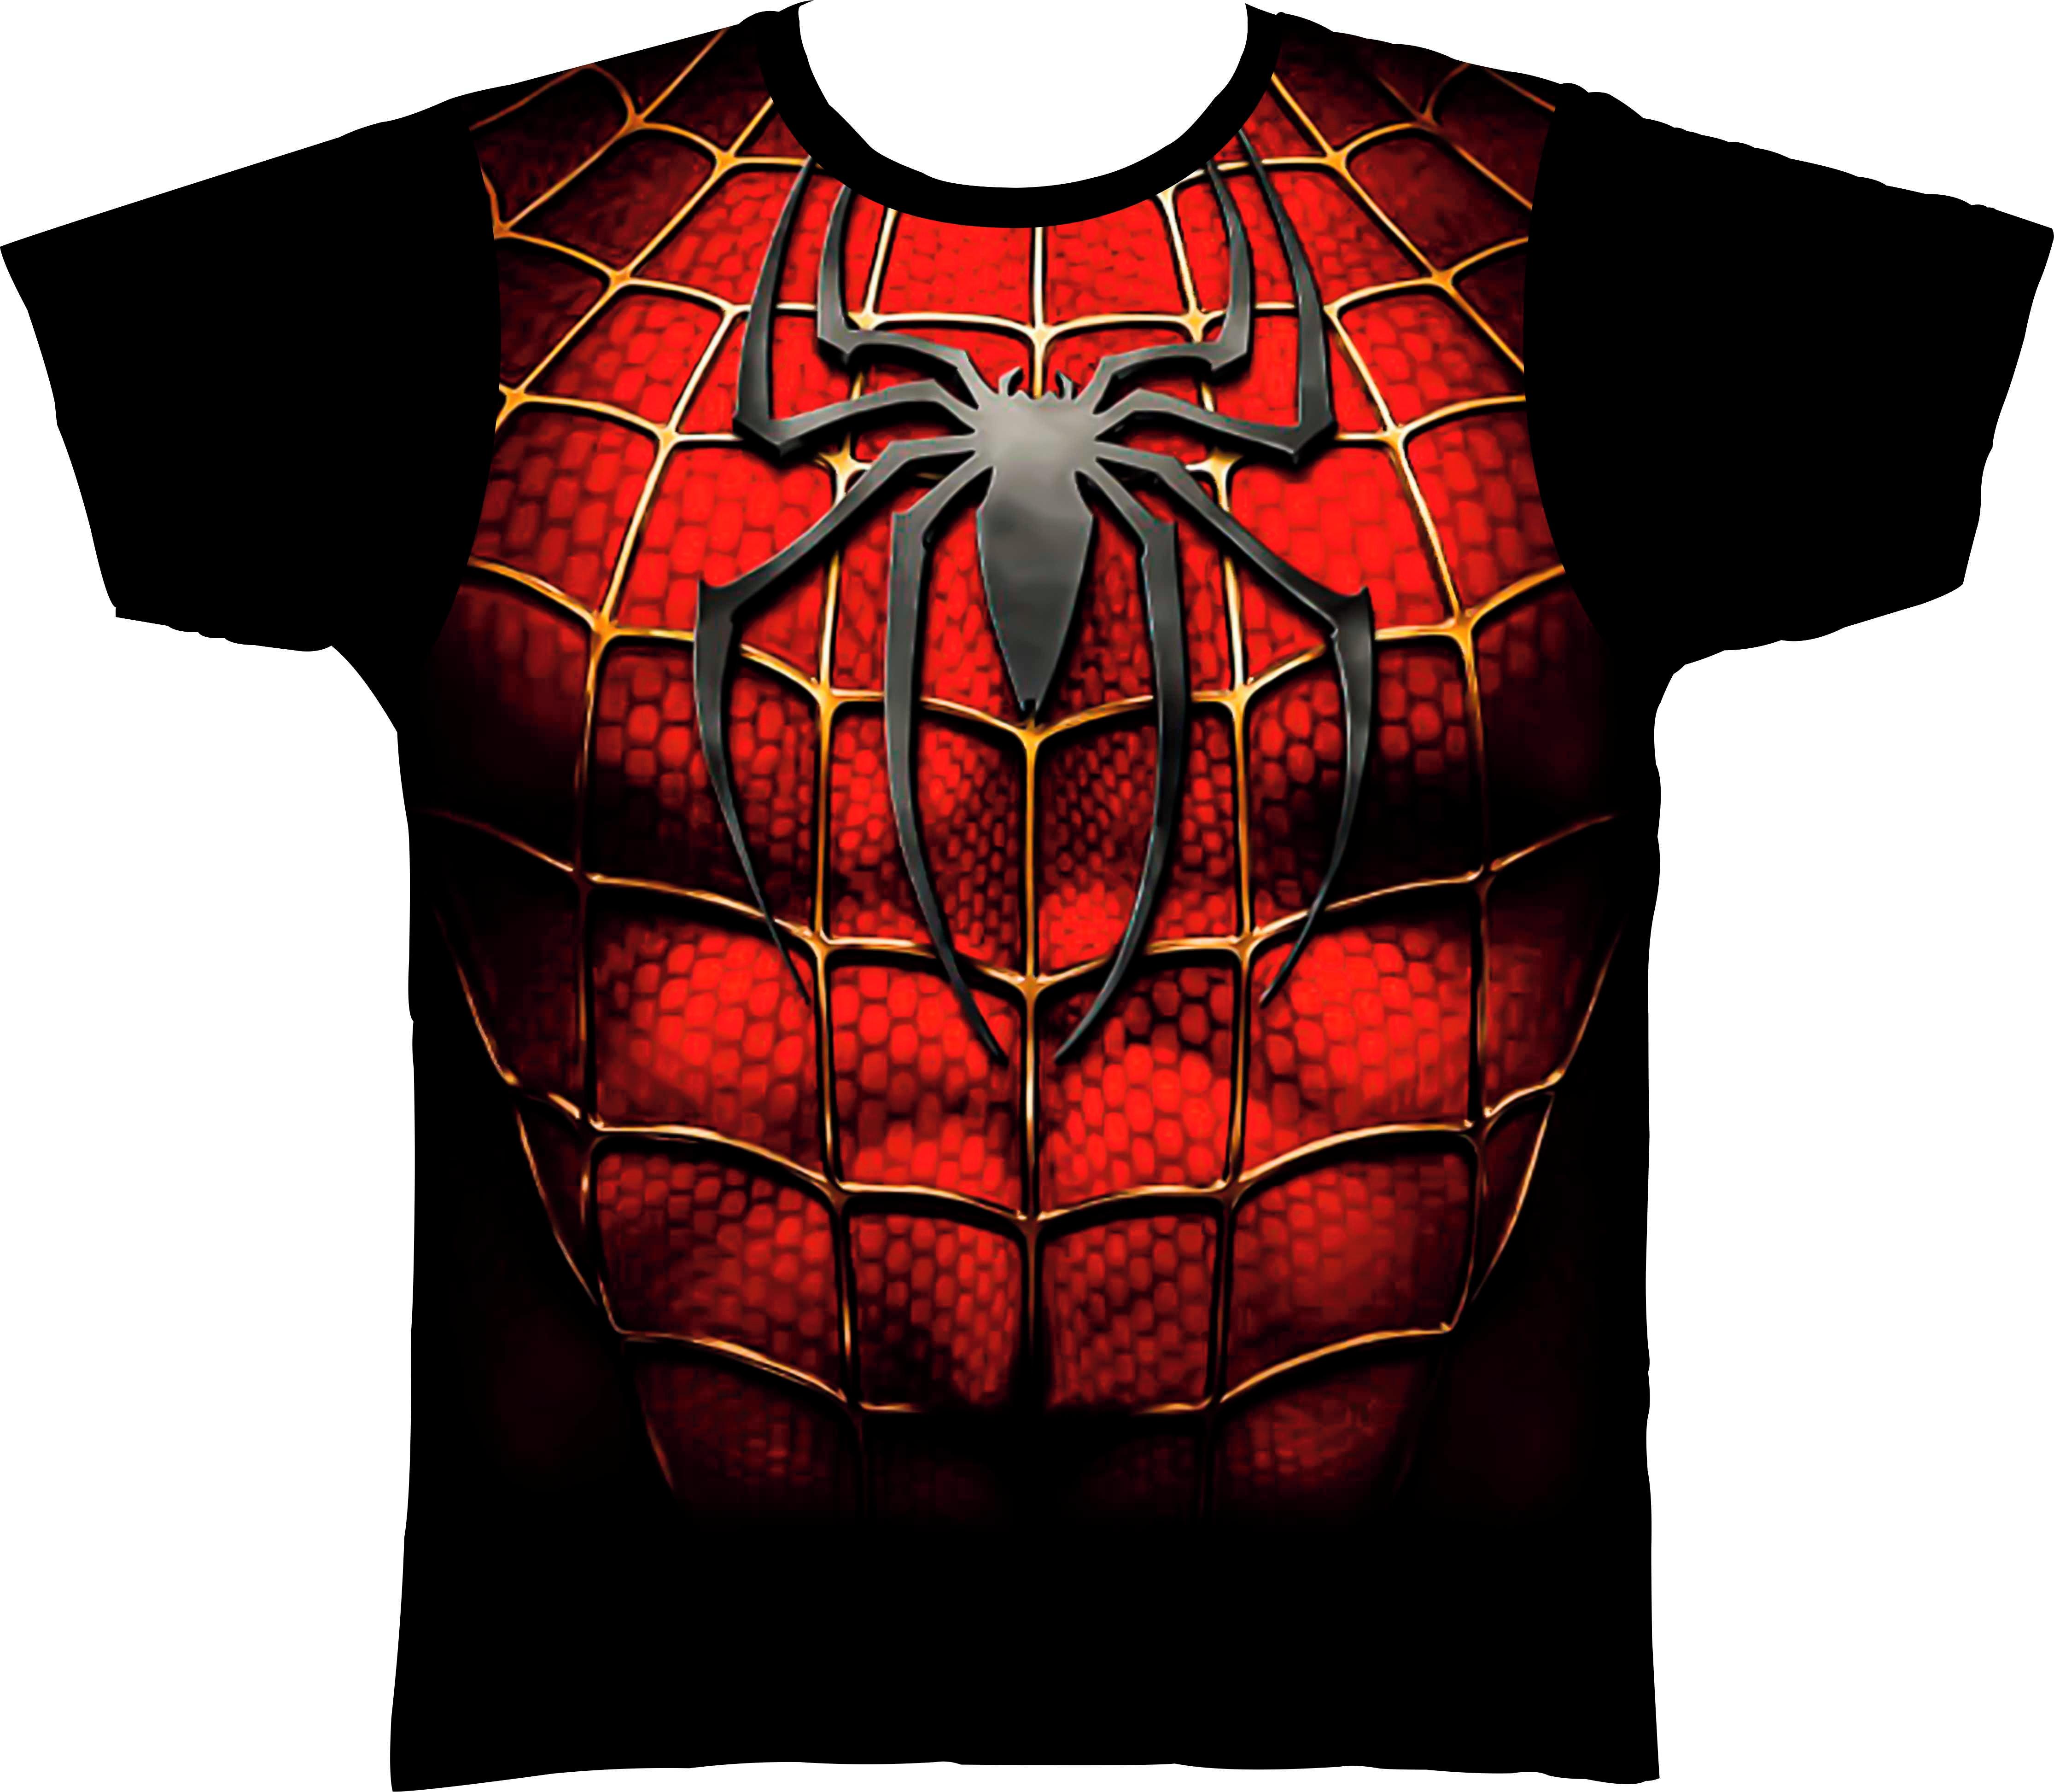 5bbd0ac05 Camiseta Fantasia Personaliza Heroi Homem Aranha Spiderman no Elo7 ...